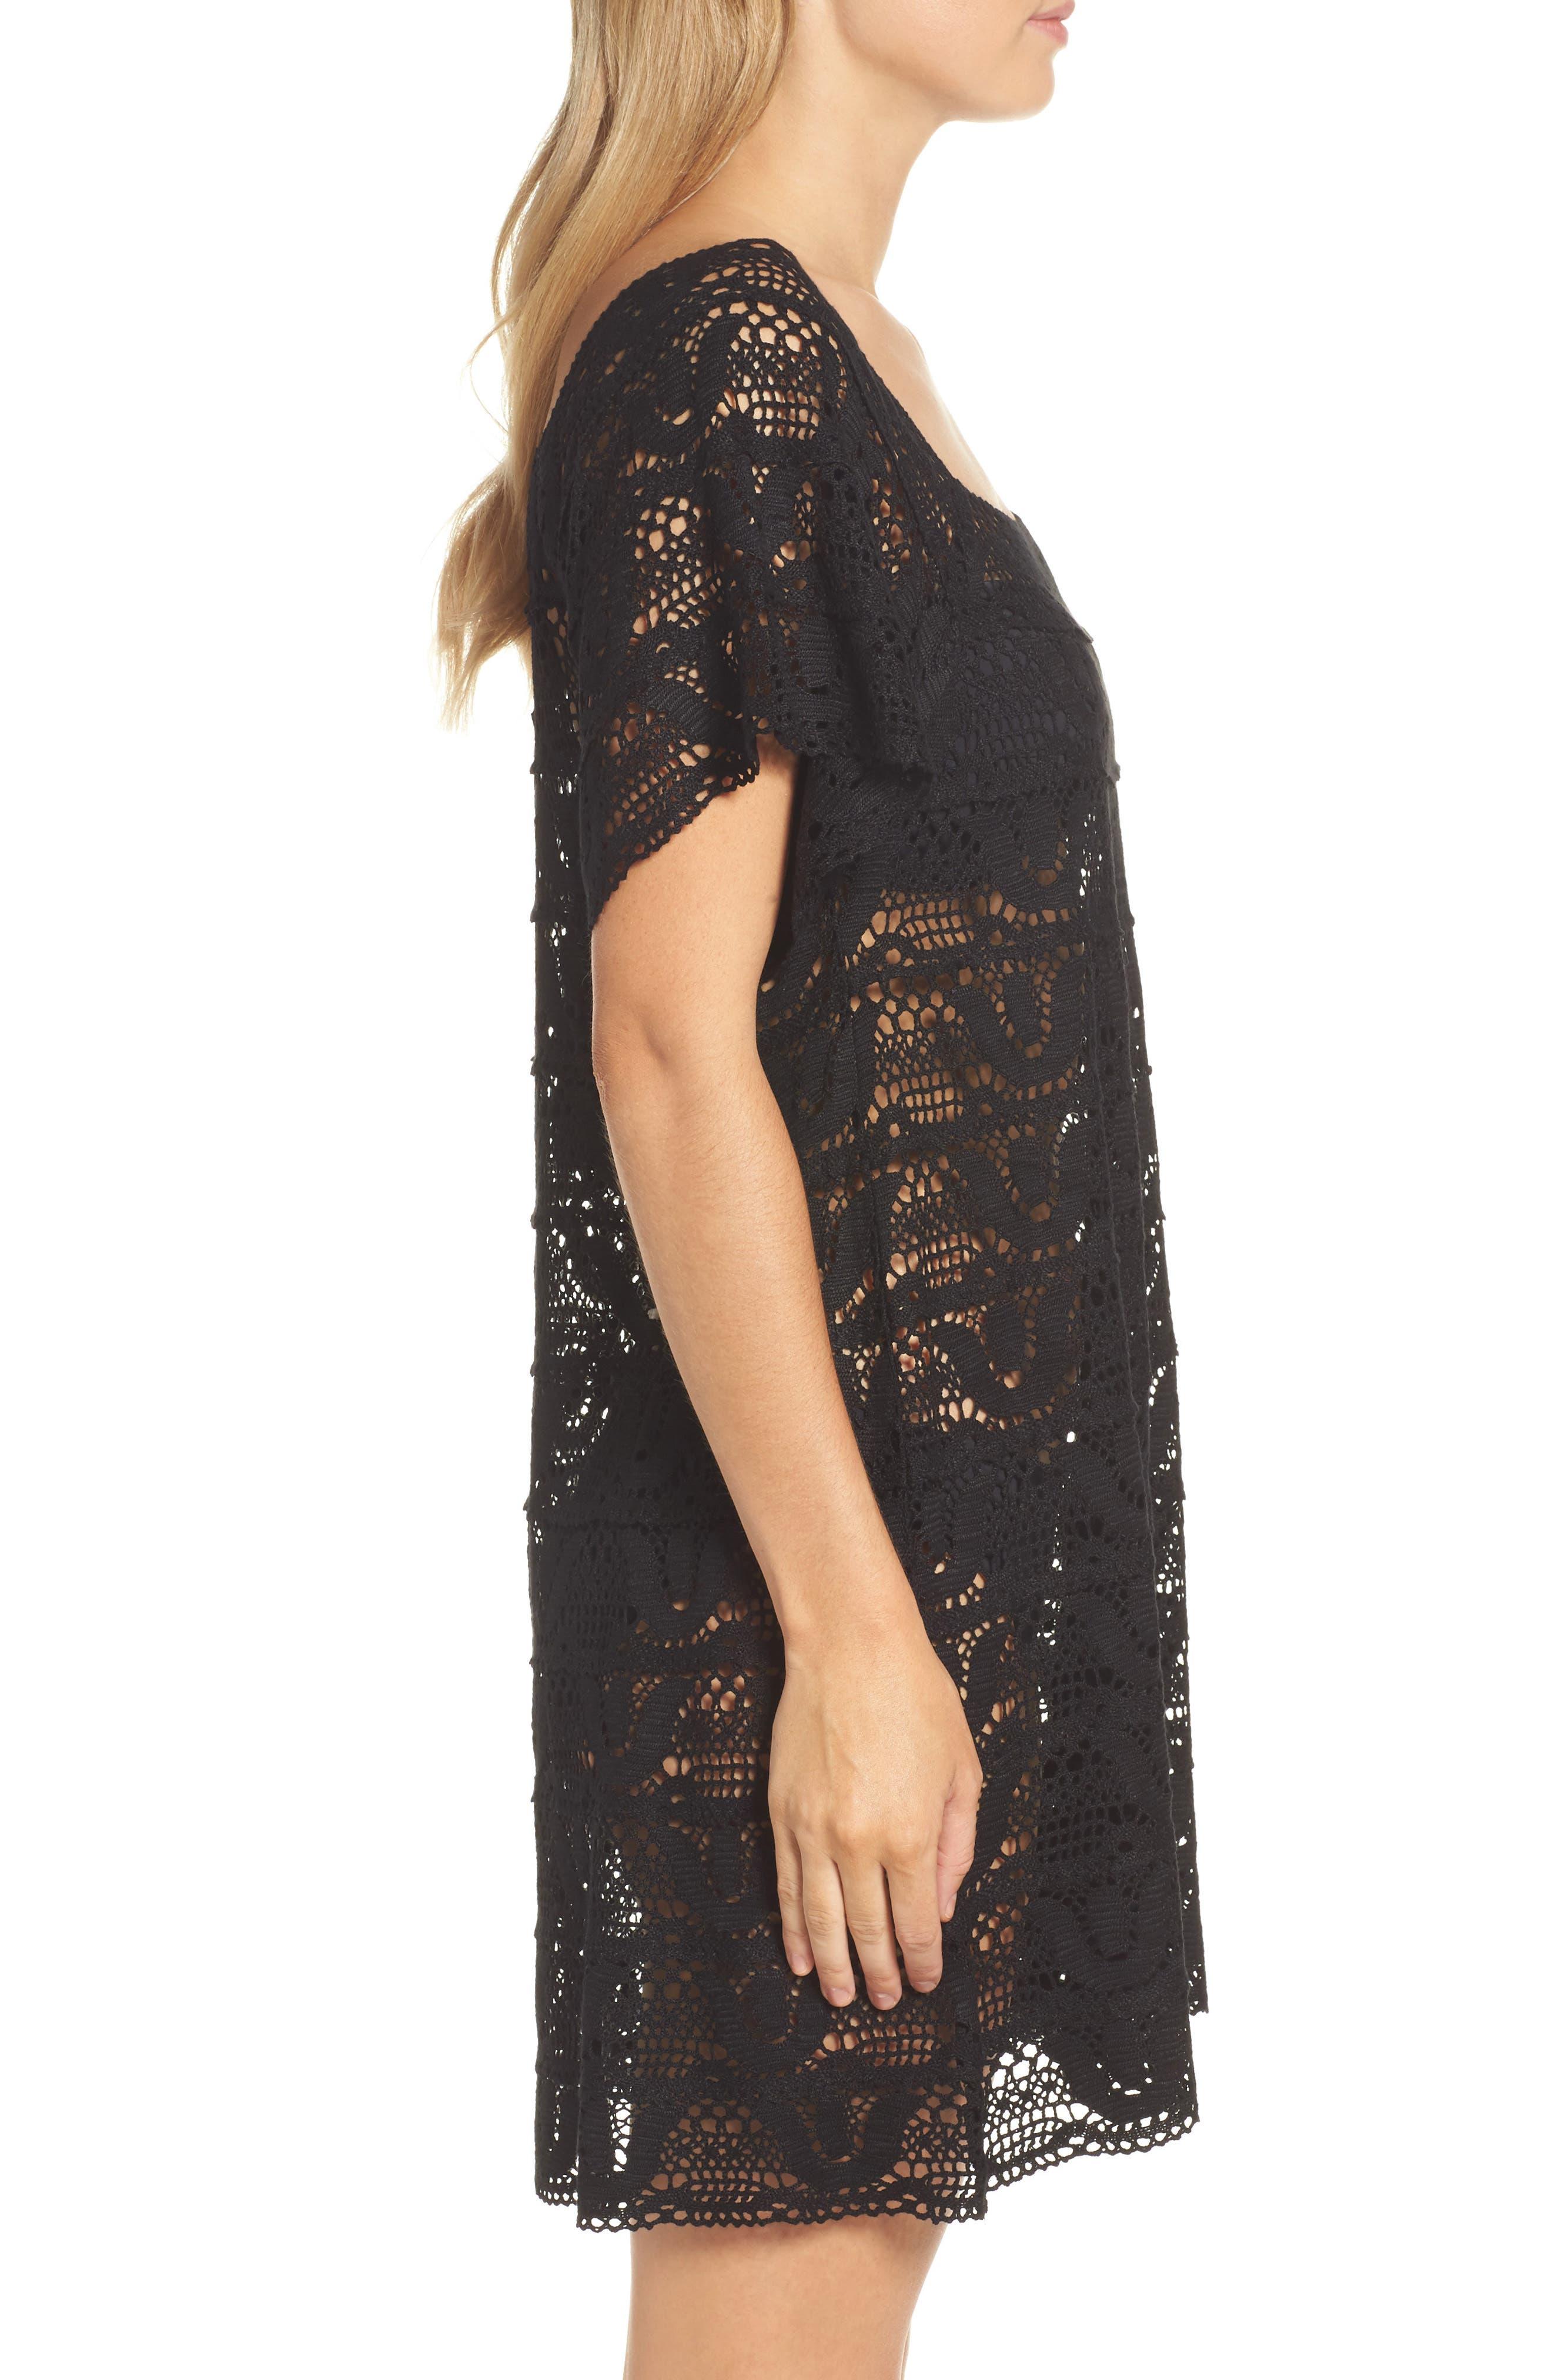 Nanette Lapore Crochet Cover-Up Dress,                             Alternate thumbnail 3, color,                             001